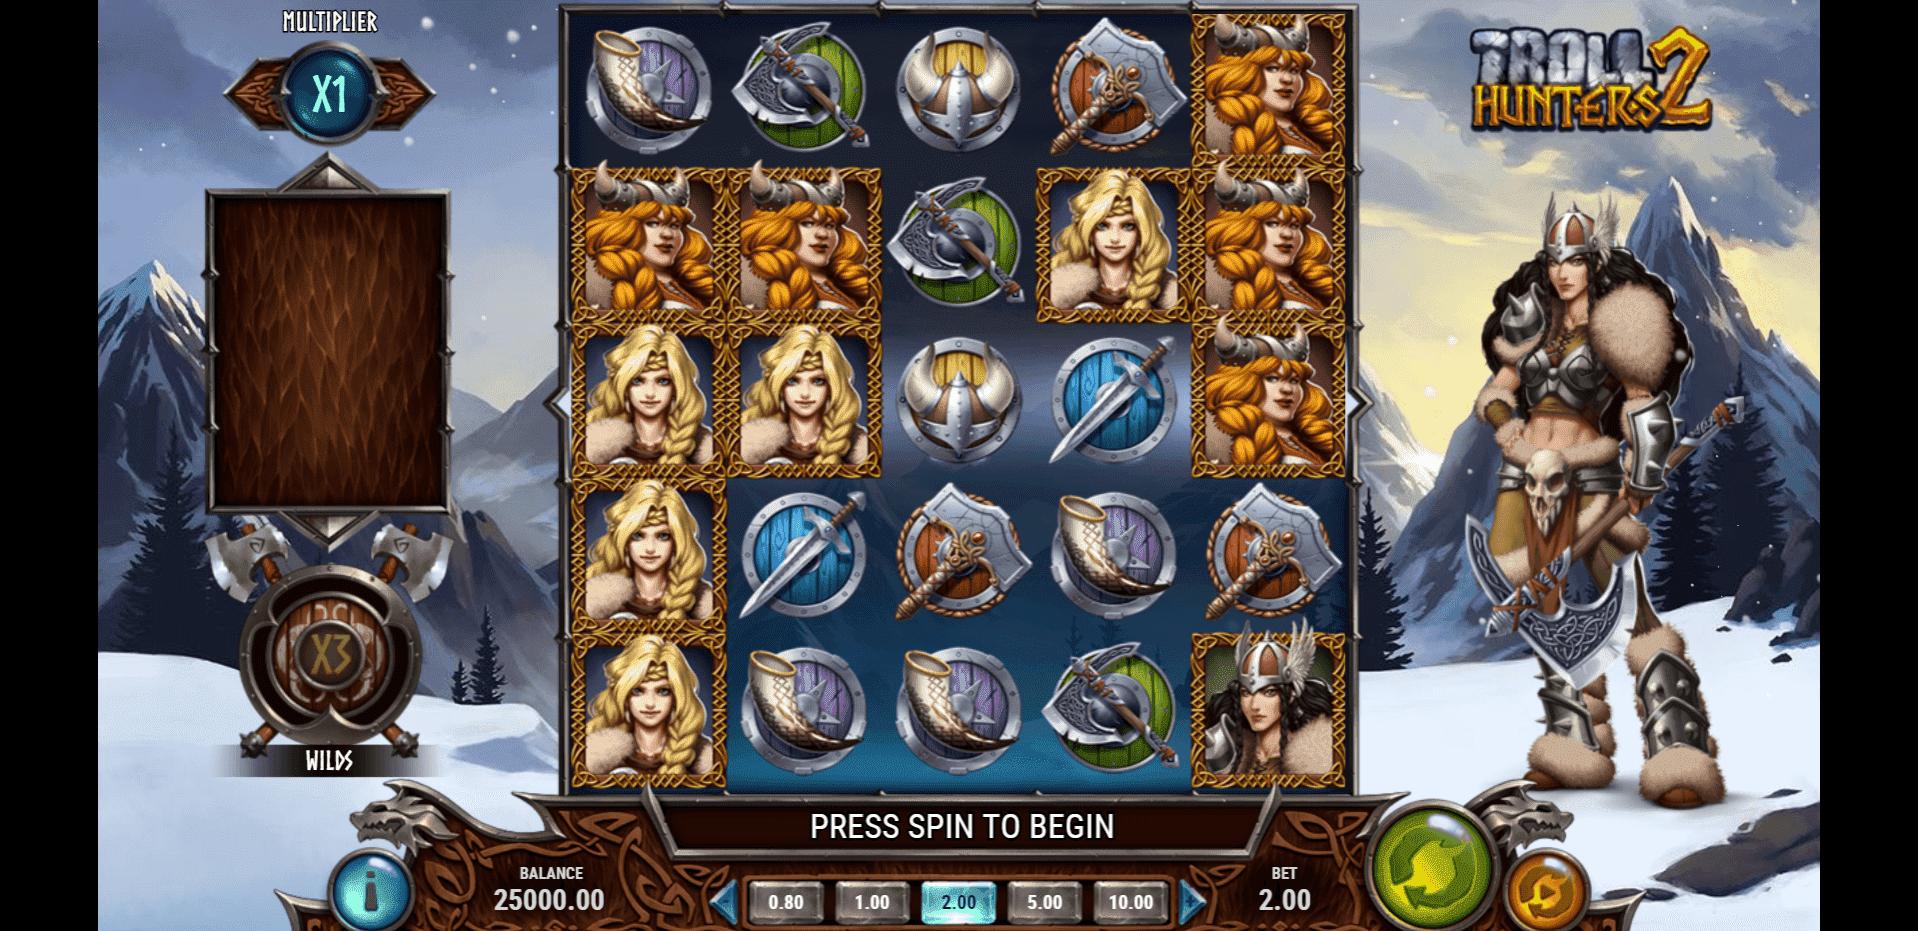 Troll Hunters 2 slot machine screenshot